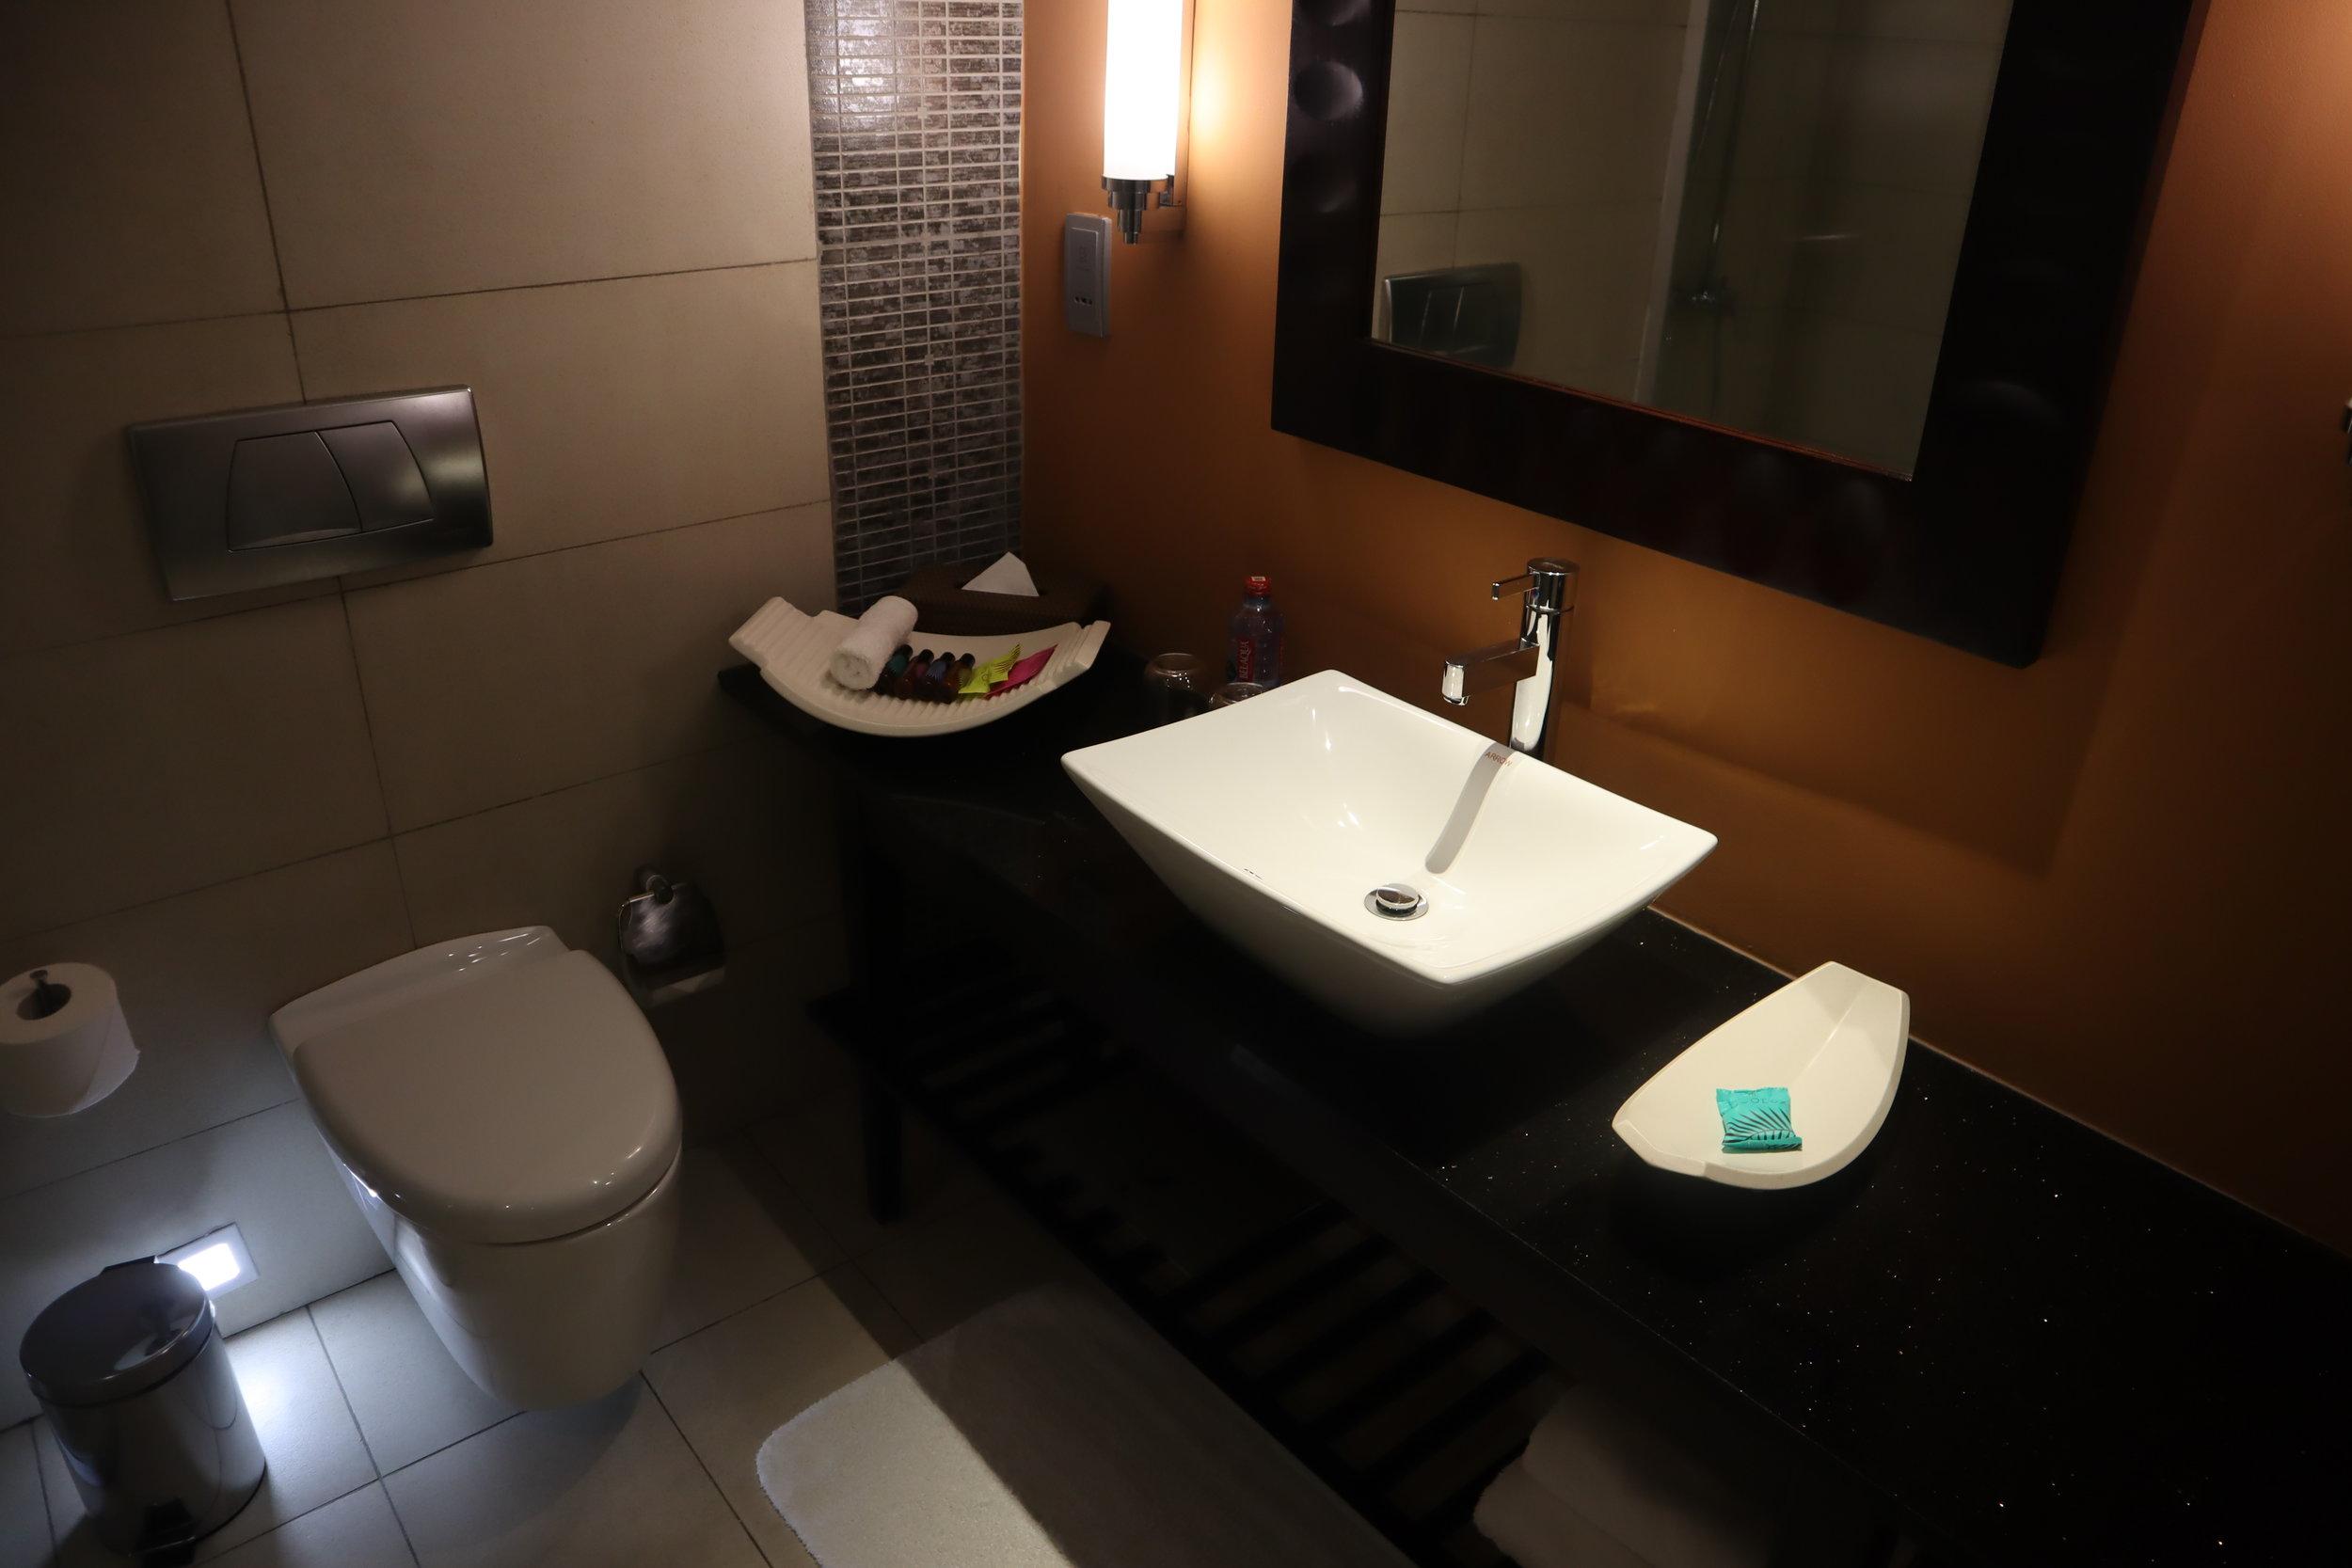 Marriott Accra – Sink and mirror